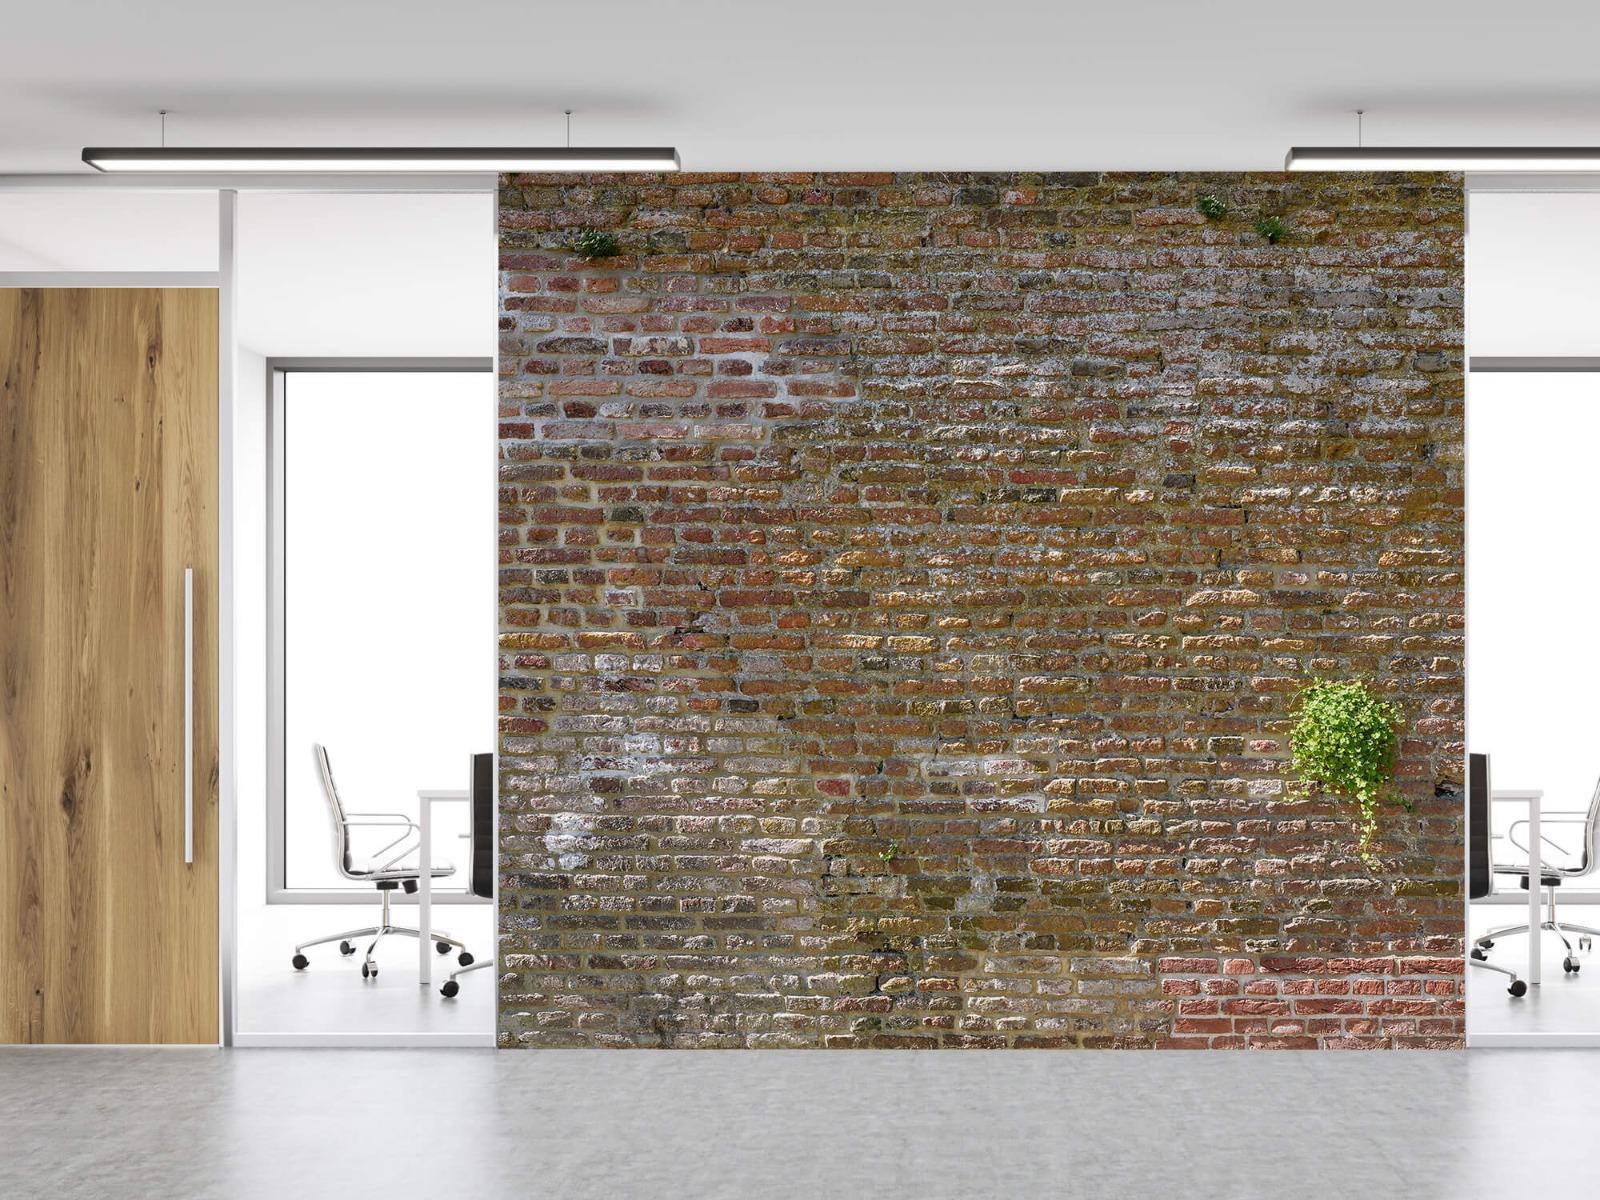 Stenen - Oude stenen stadsmuur met plantjes 11